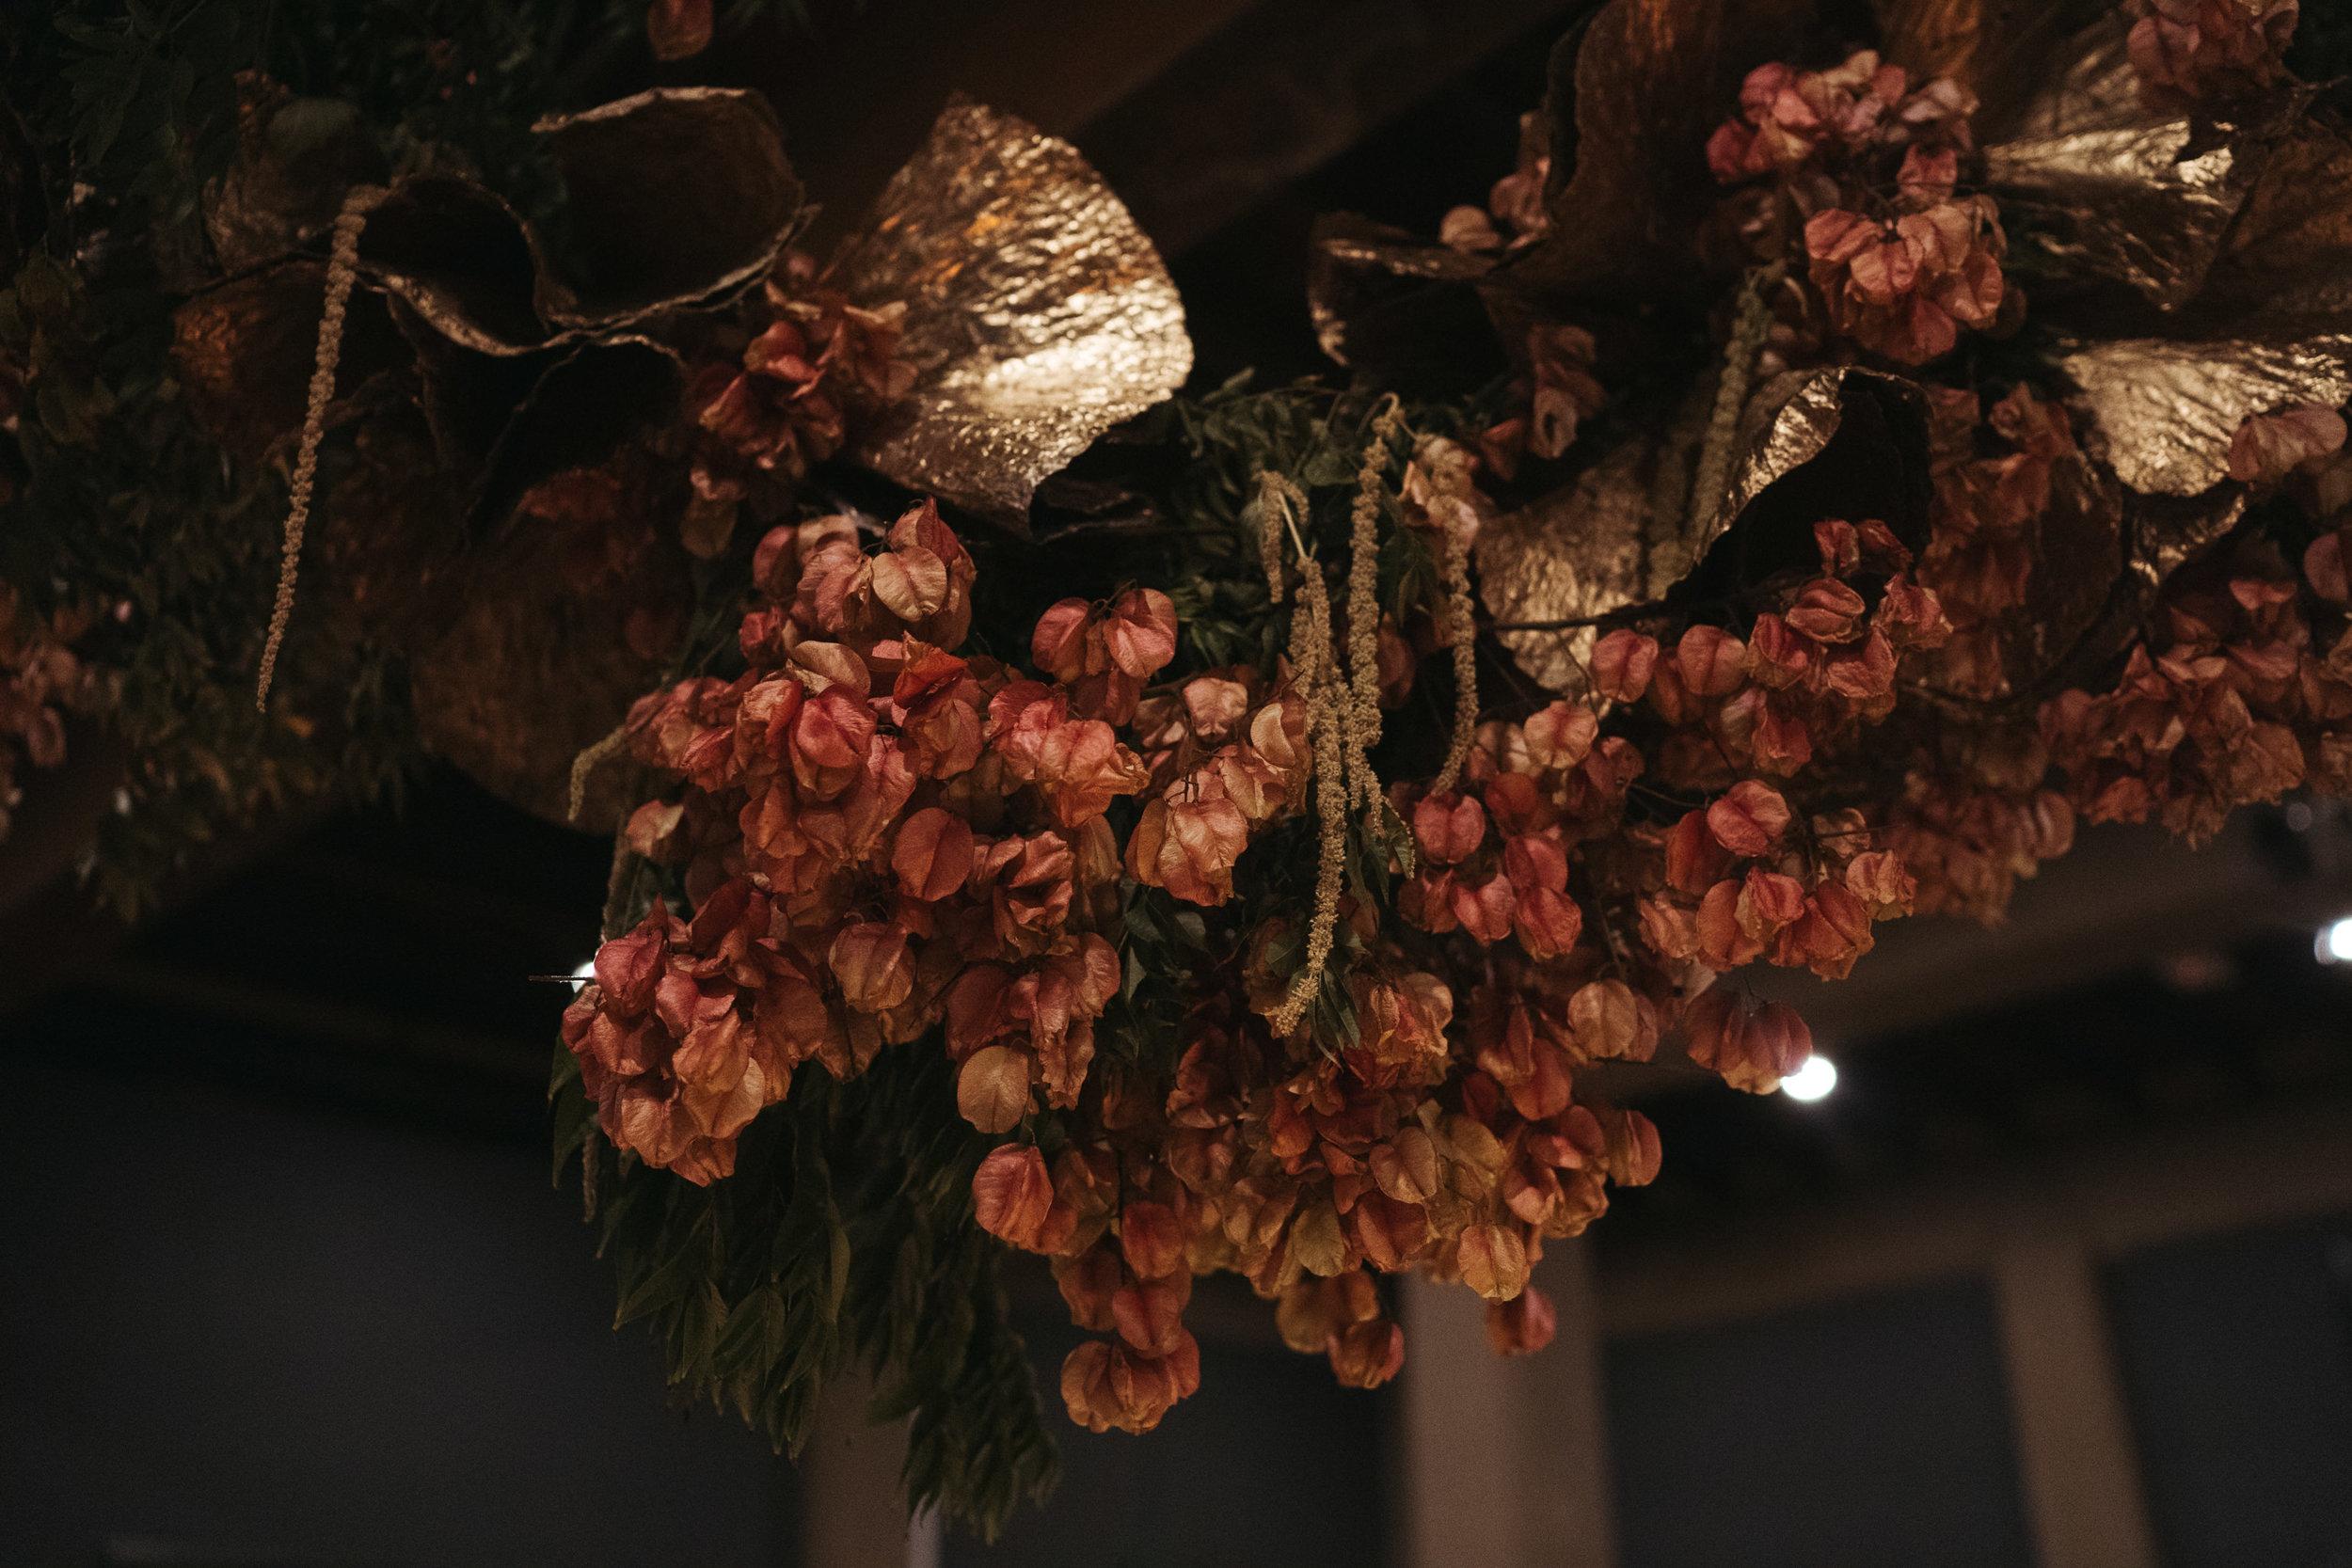 The Lushington Brisbane - Ephemeral Creative - Akirah Collective floral hanging installation